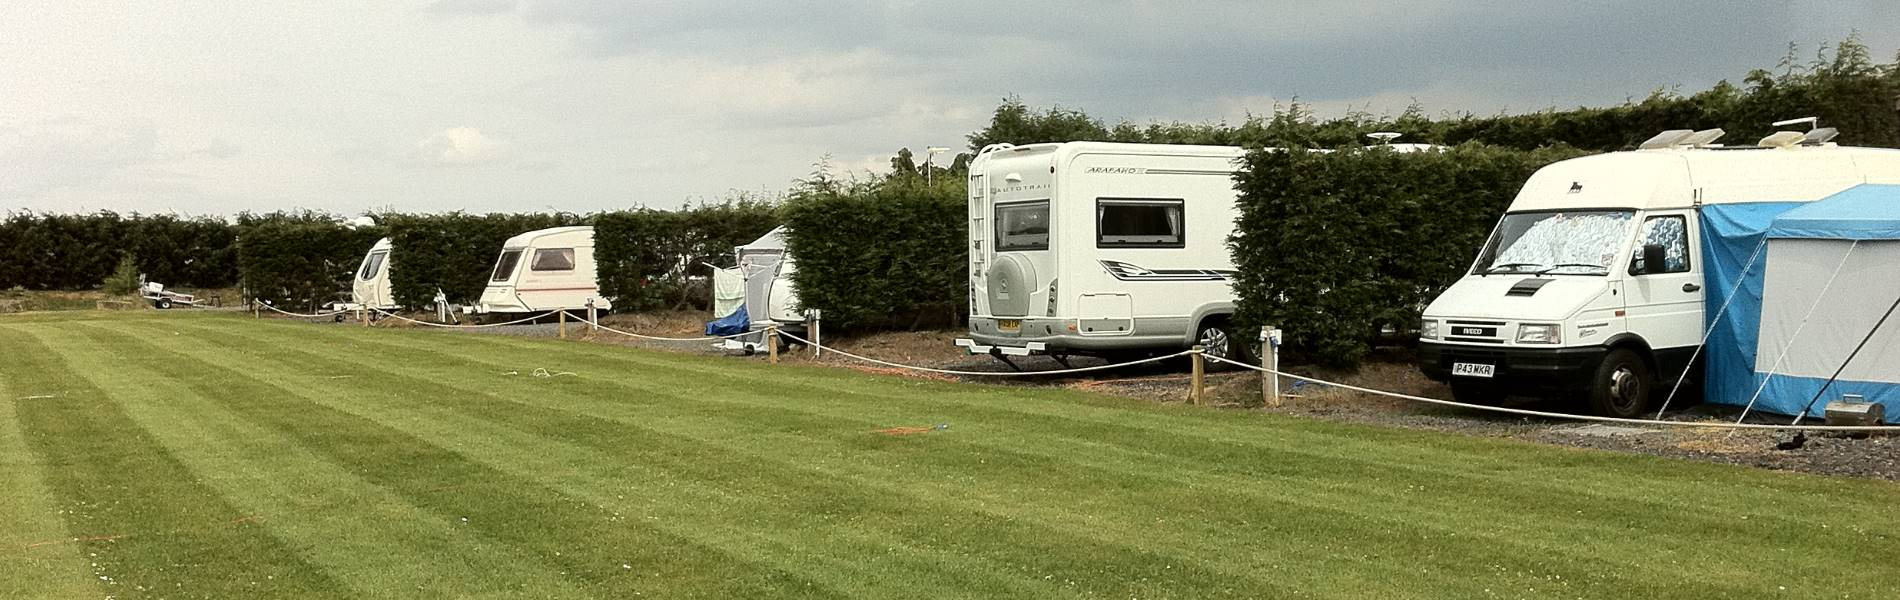 Adult Only Caravan Site